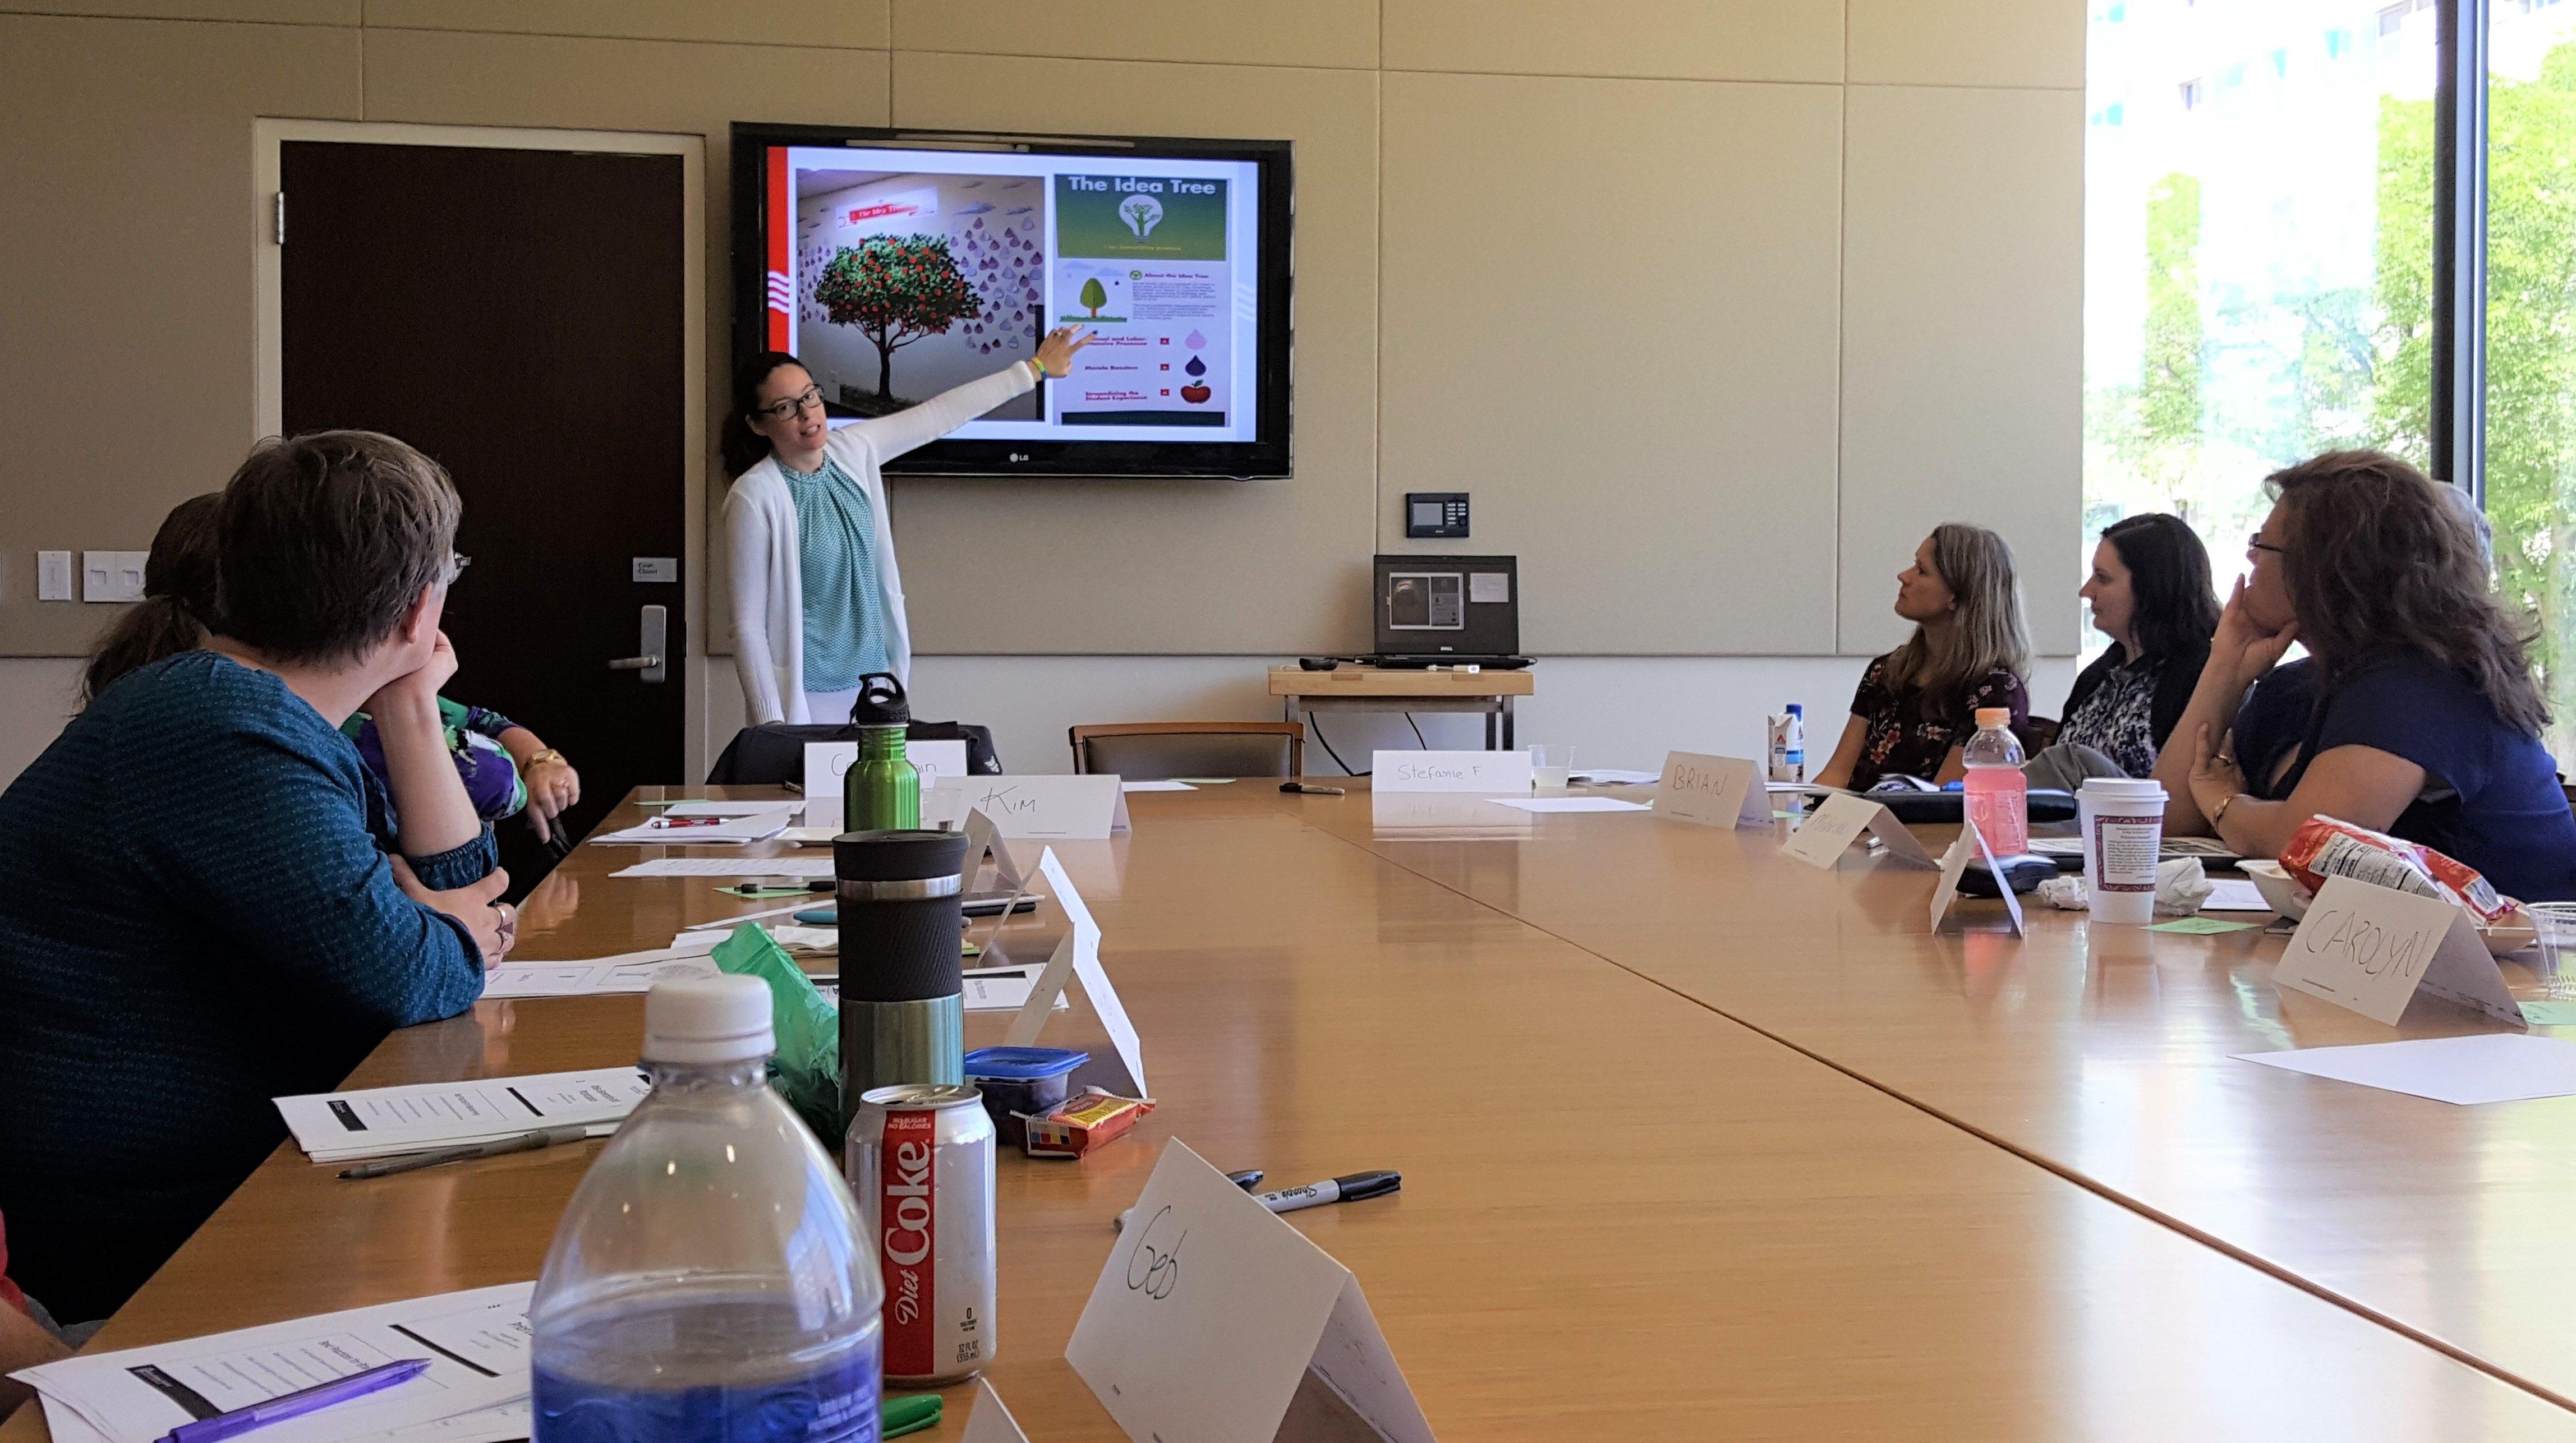 Cori Splain pointing to a slide showing an idea tree.